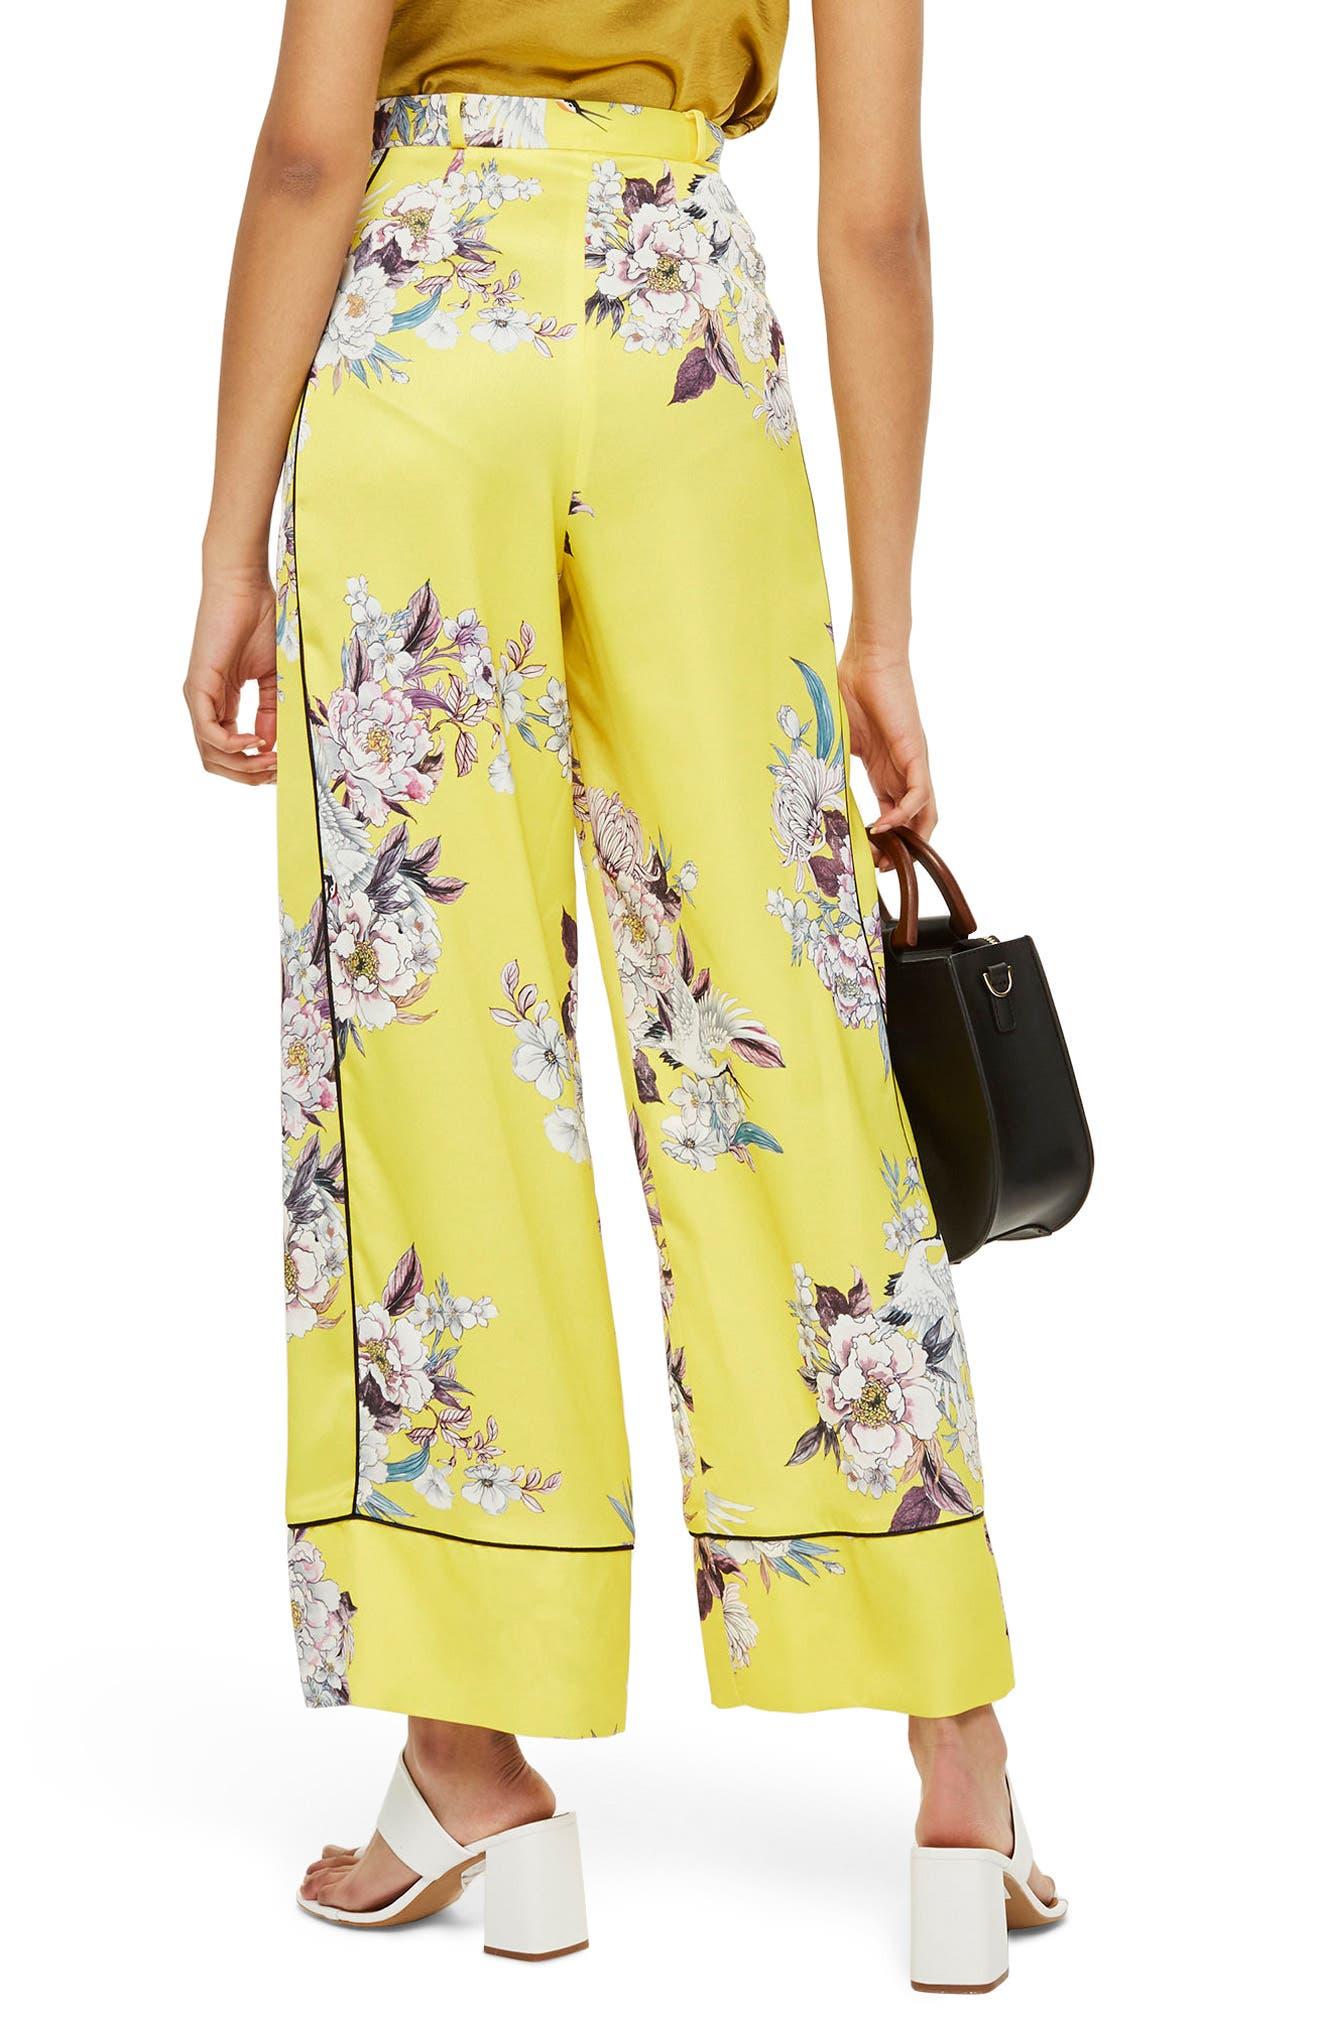 Heron Pajama Wide Leg Trousers,                             Alternate thumbnail 3, color,                             Yellow Multi